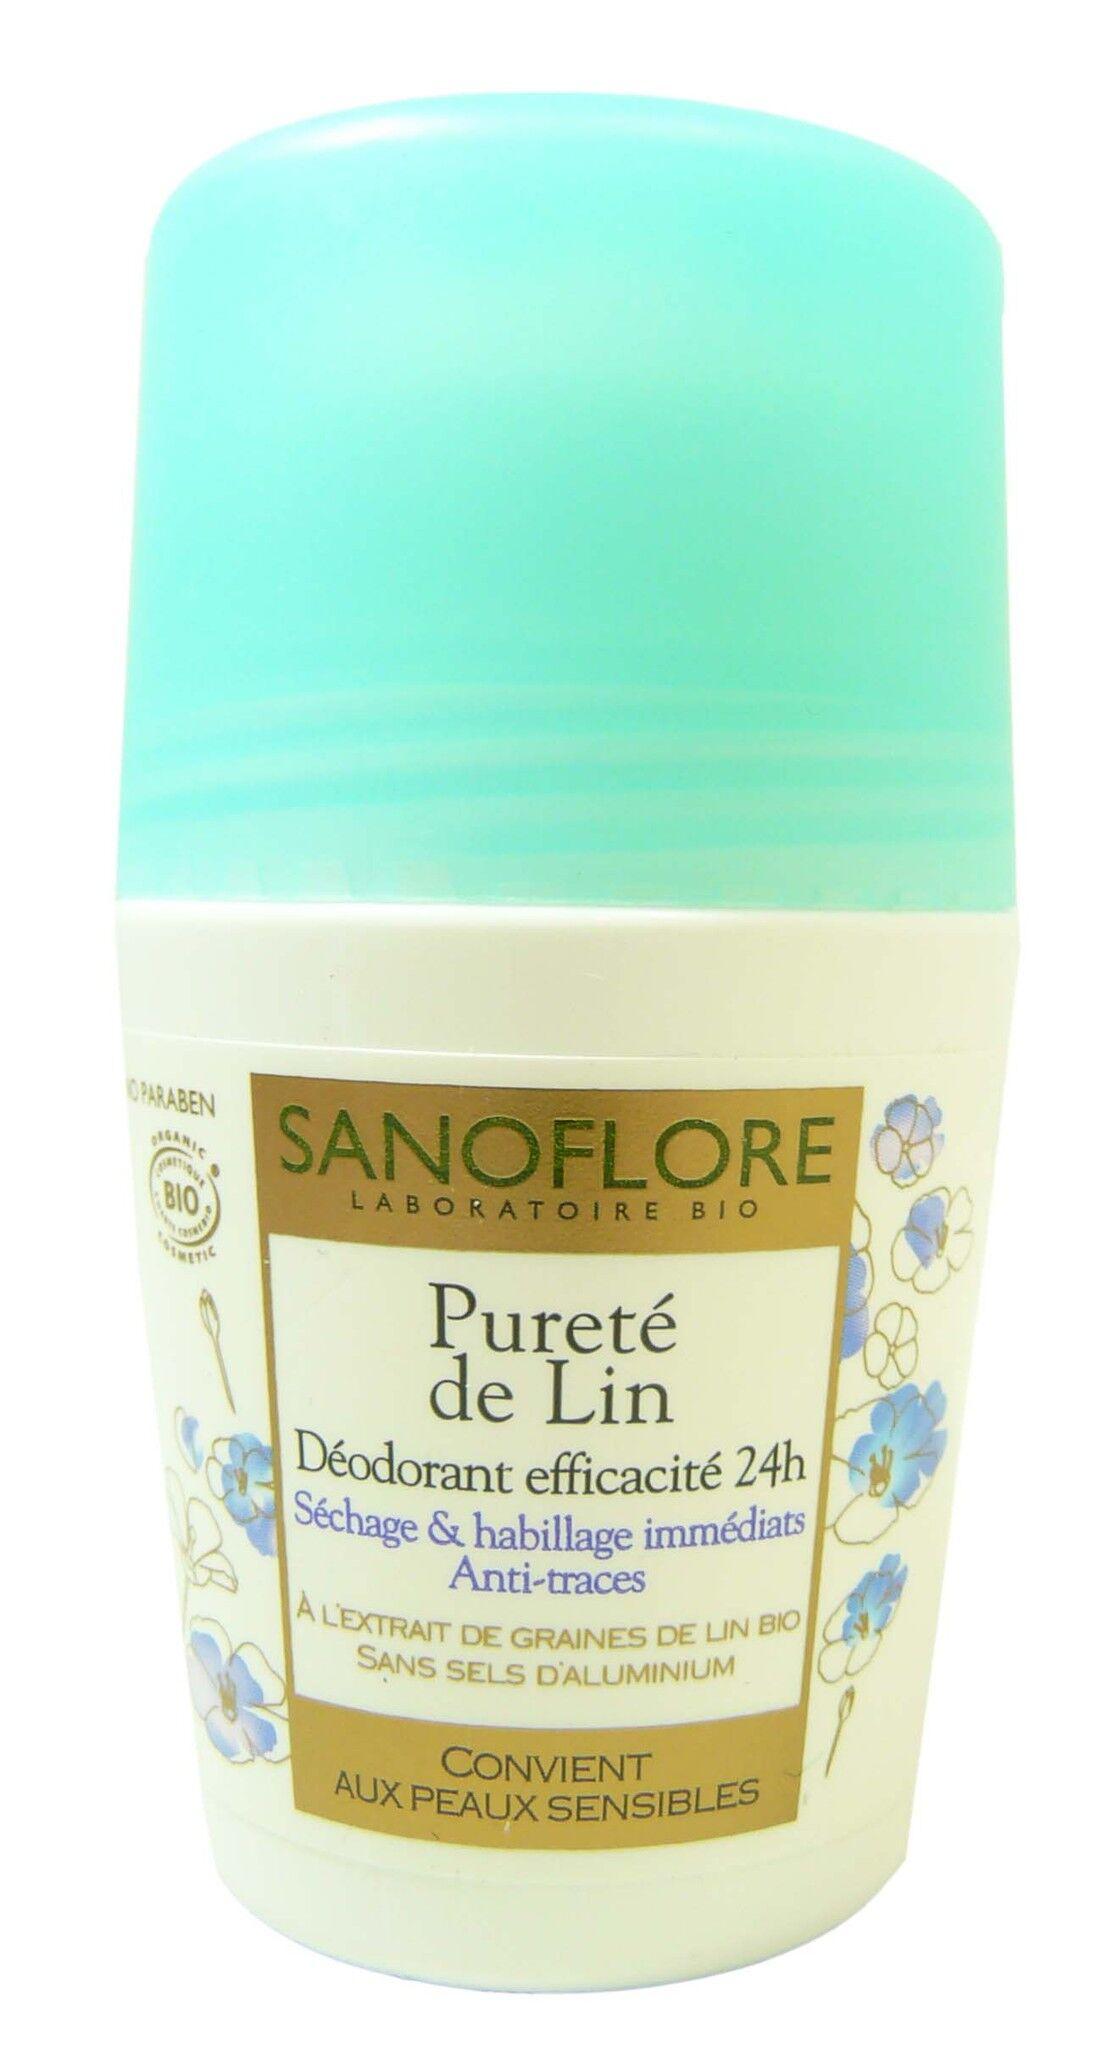 Sanoflore deo roll on 24h purete de lin 50ml